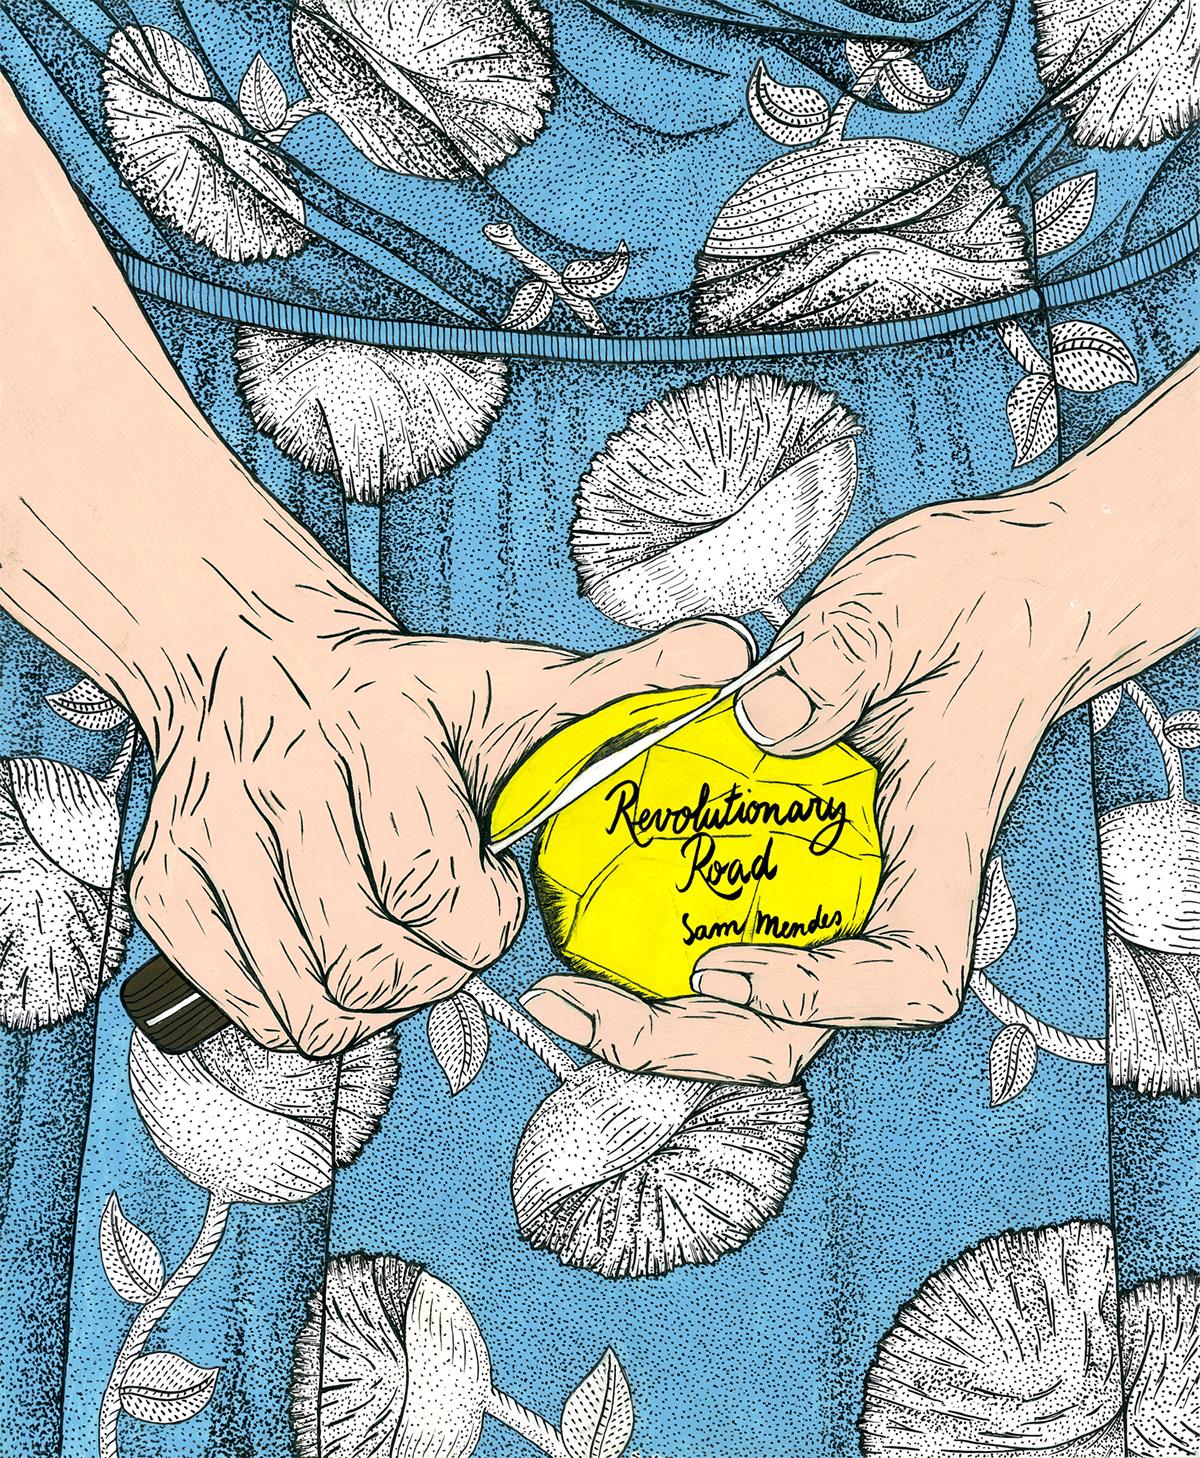 shutter island poster movie poster Cinema single man Amelie Poulain restless Revolutionary Road Billy Elliot the reader martin scorsese gus van sant jean pierre jeunet acrylic indian ink